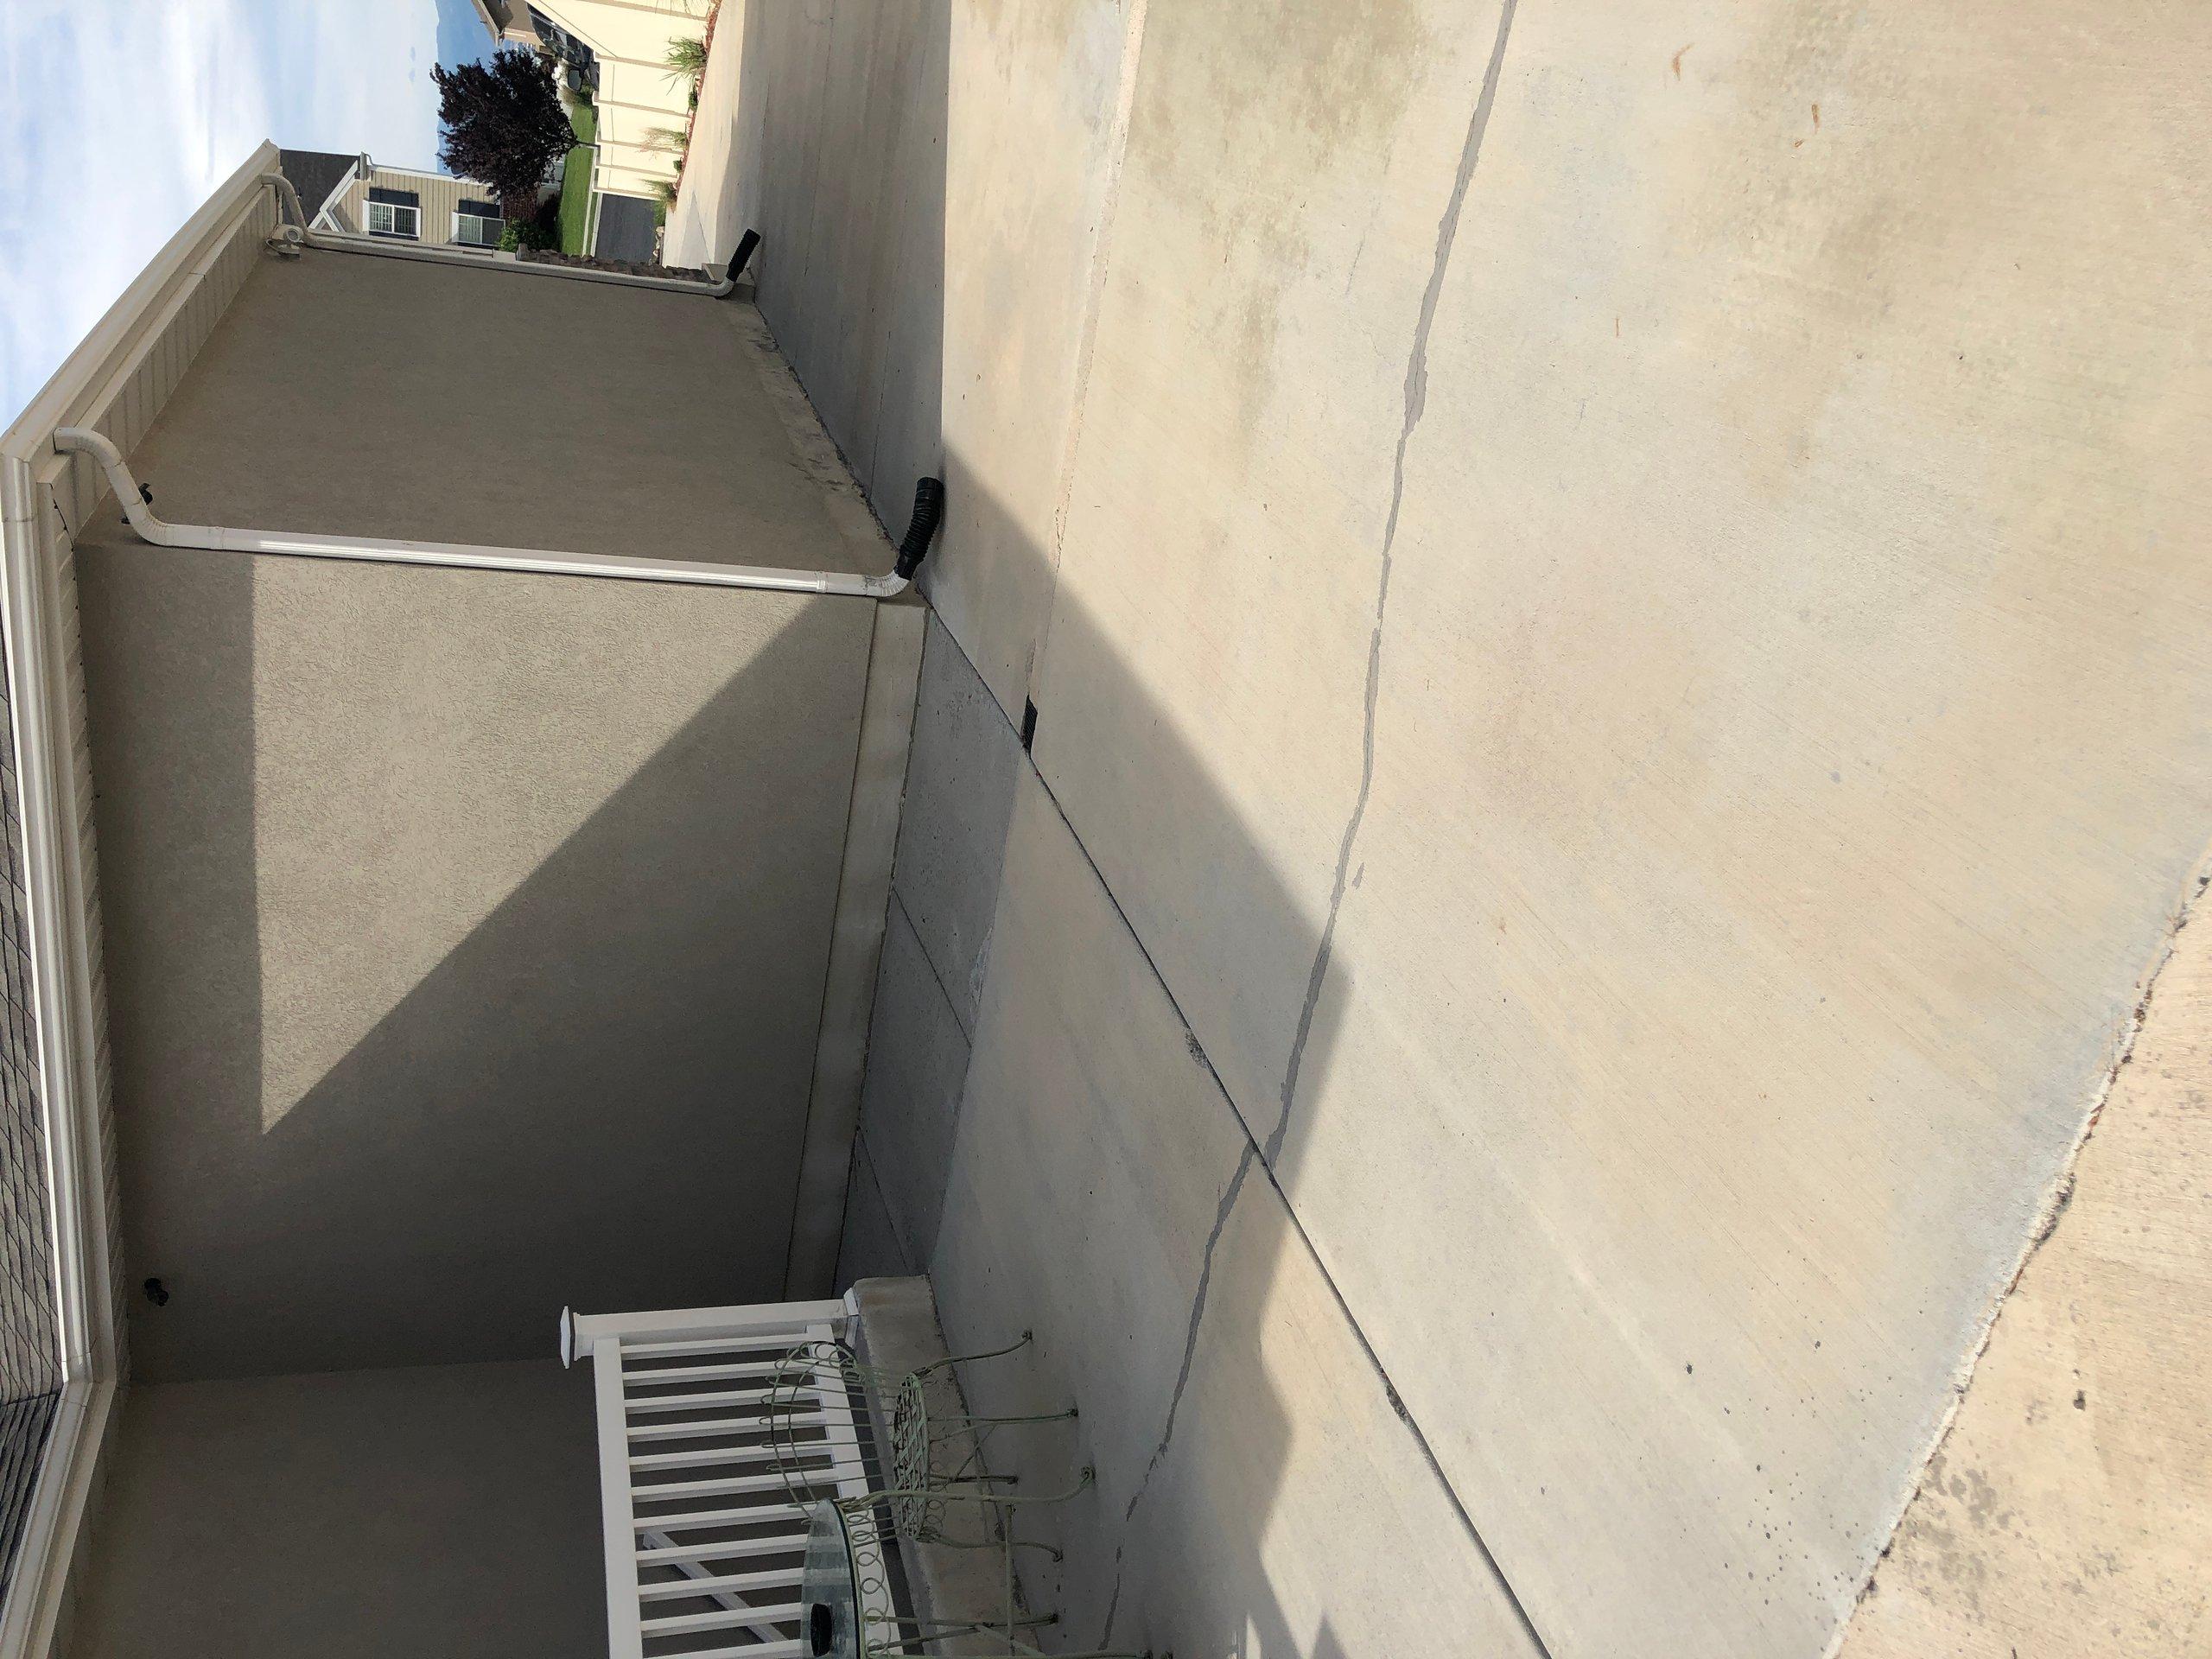 30x30 Driveway self storage unit